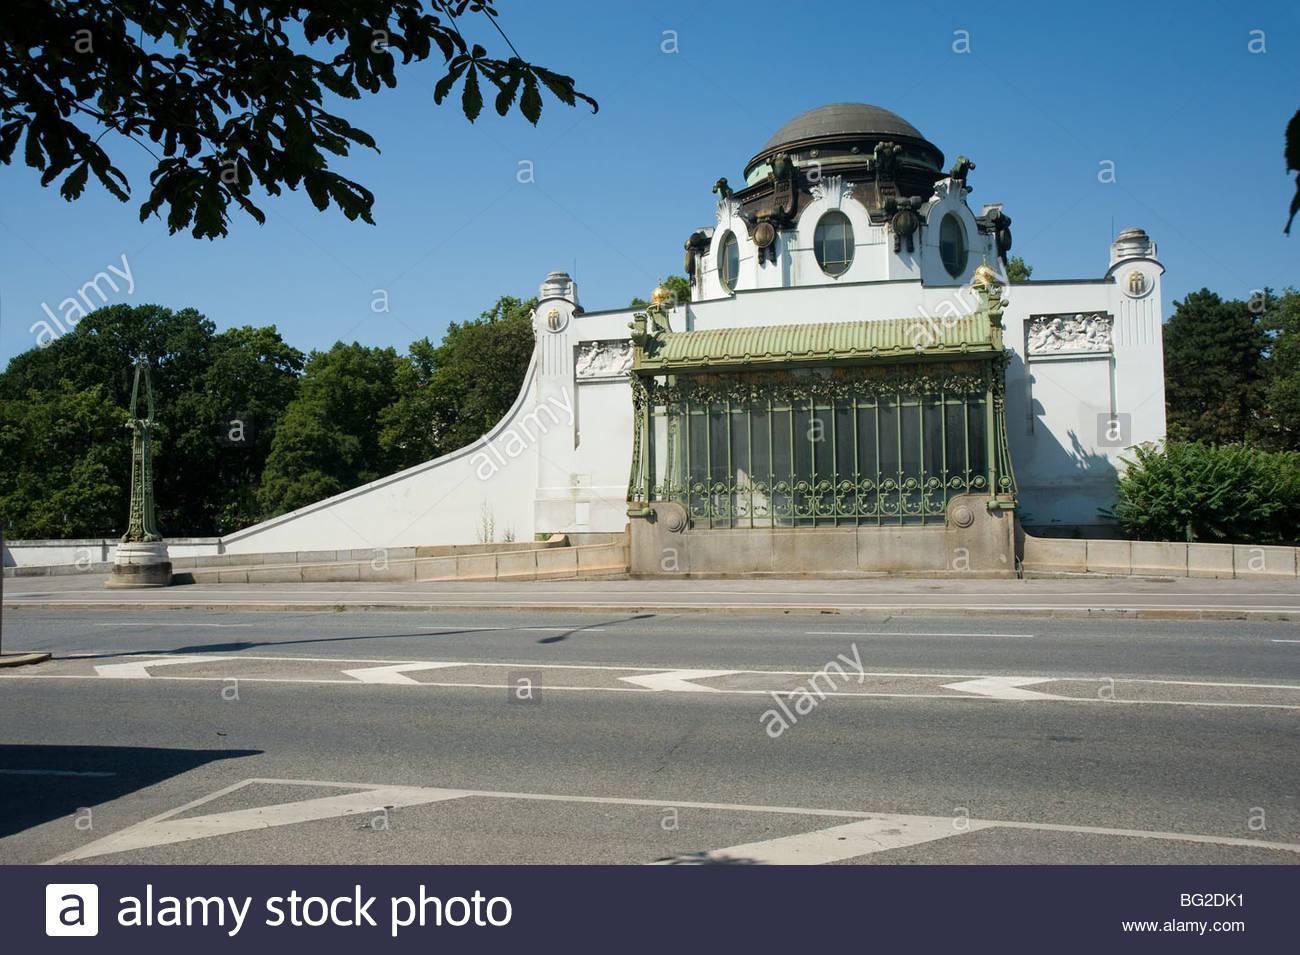 Wien, Stadtbahn, Hofpavillon Hietzing, Architekt Otto Wagner 1899 - Vienna, Otto Wagner's Stadtbahn Station - Stock Image